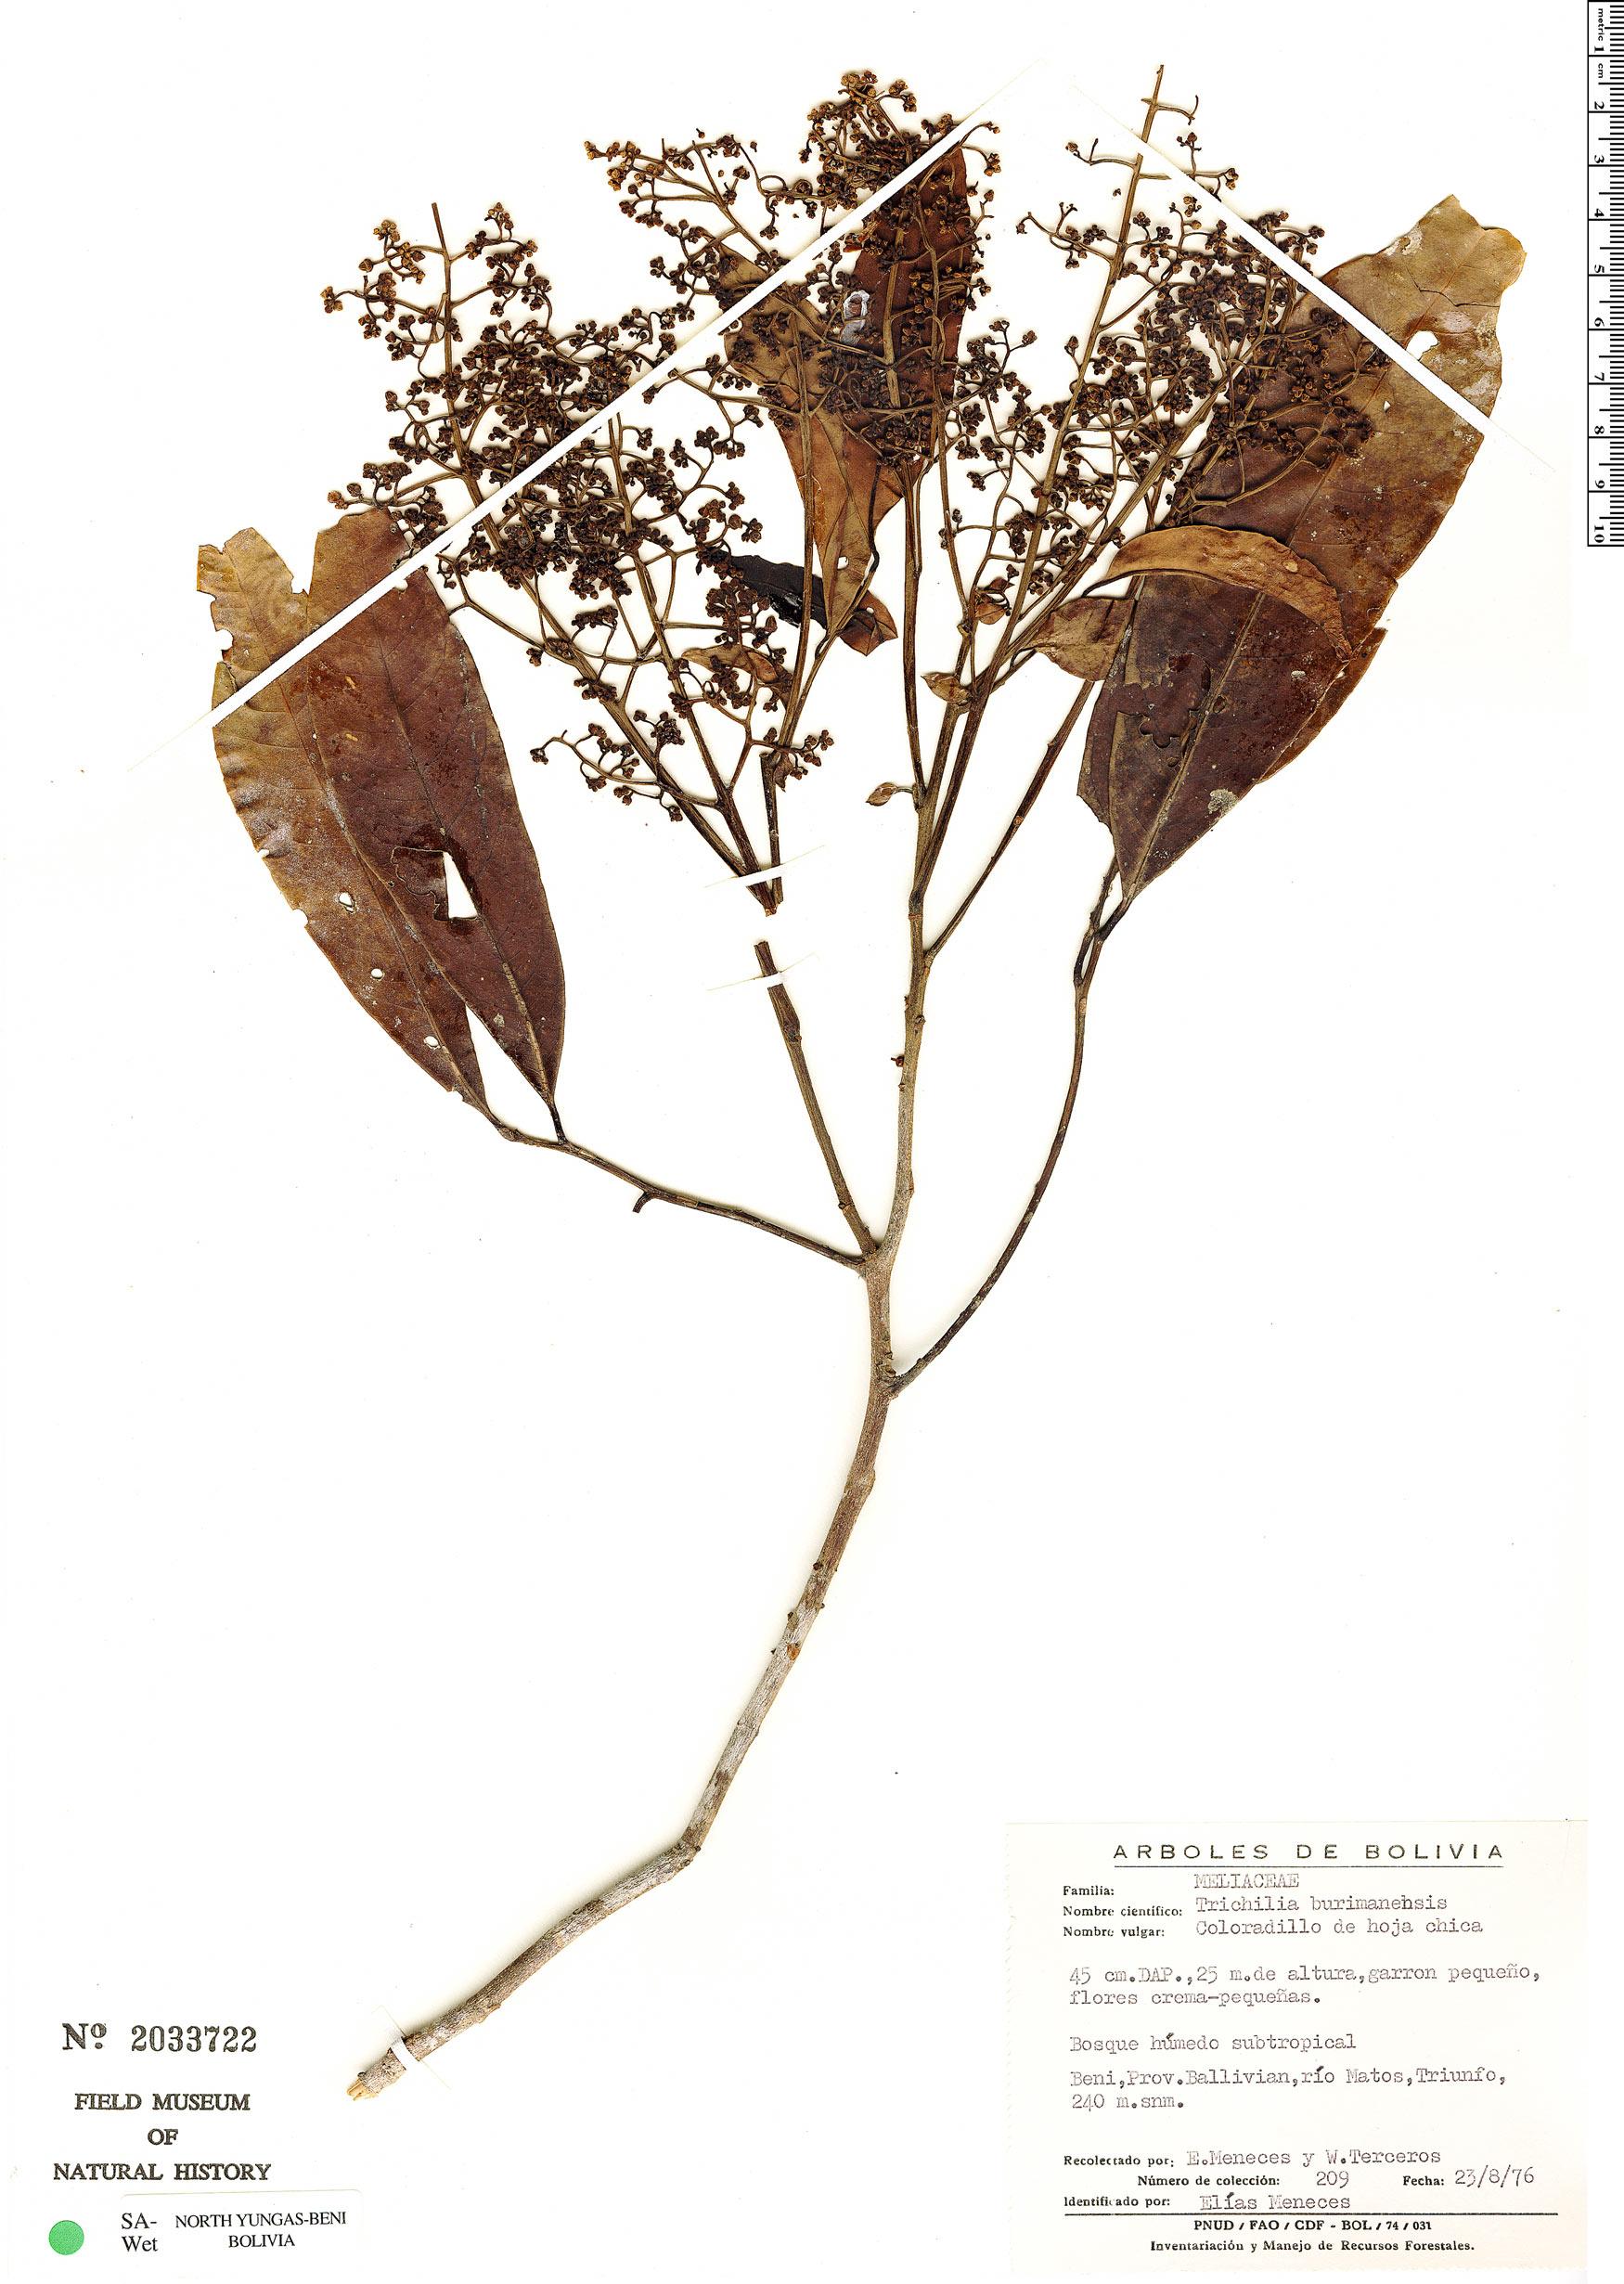 Specimen: Trichilia pleeana